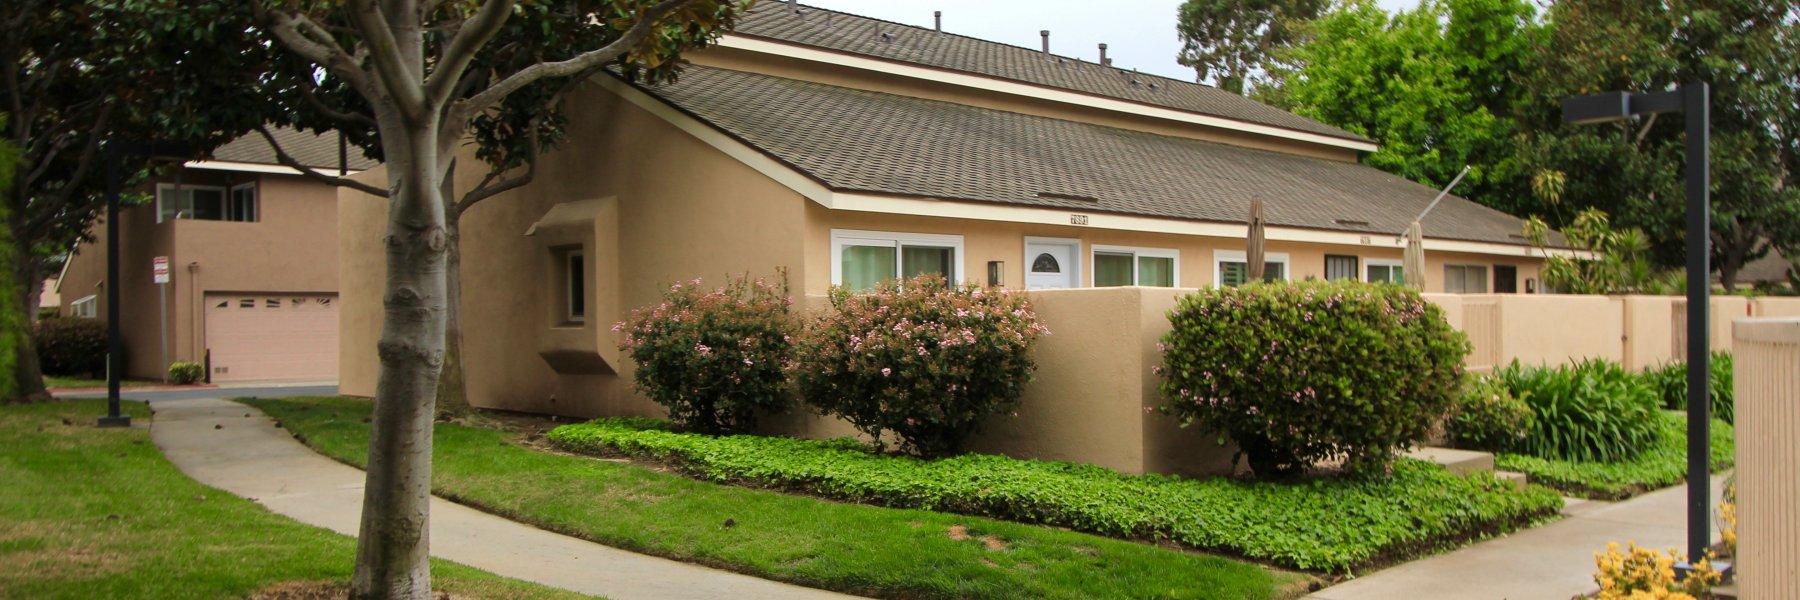 Huntington Cove is a community of condos in Huntington Beach California